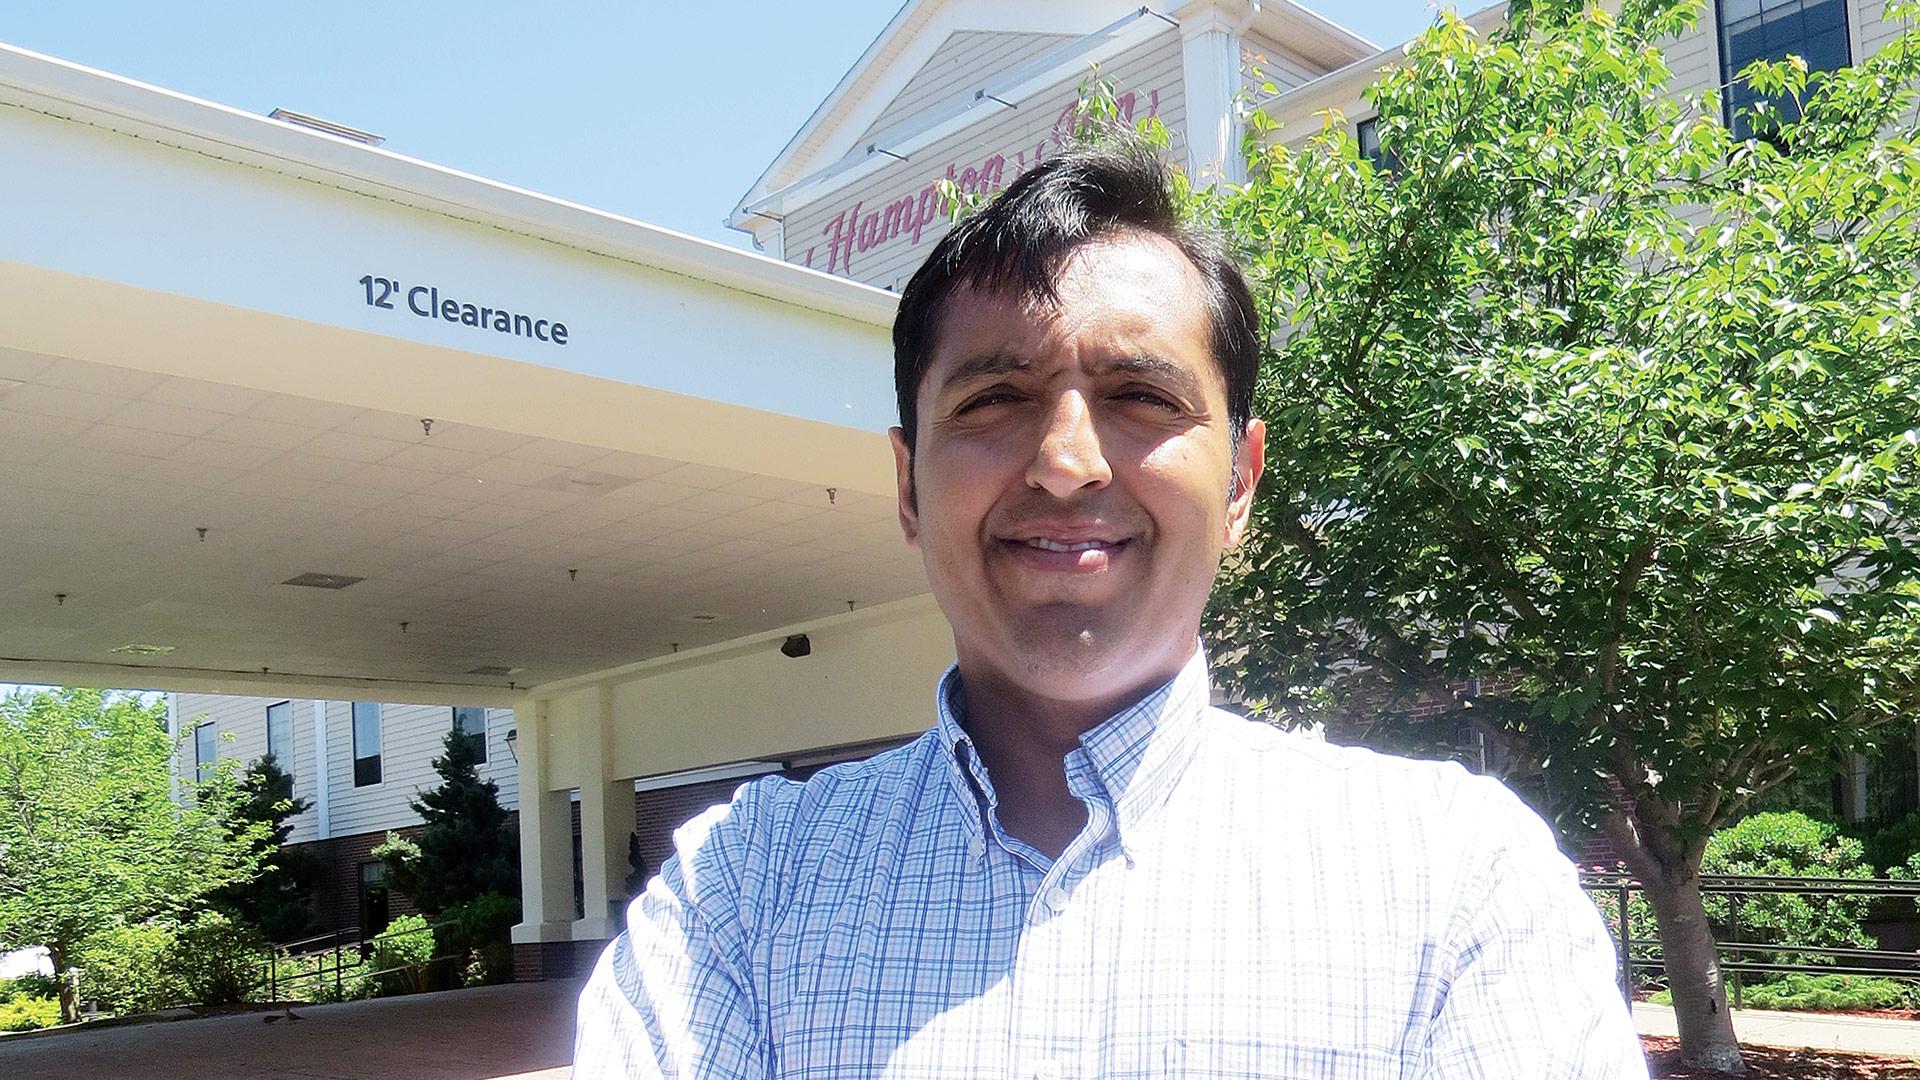 Kishore Parmar